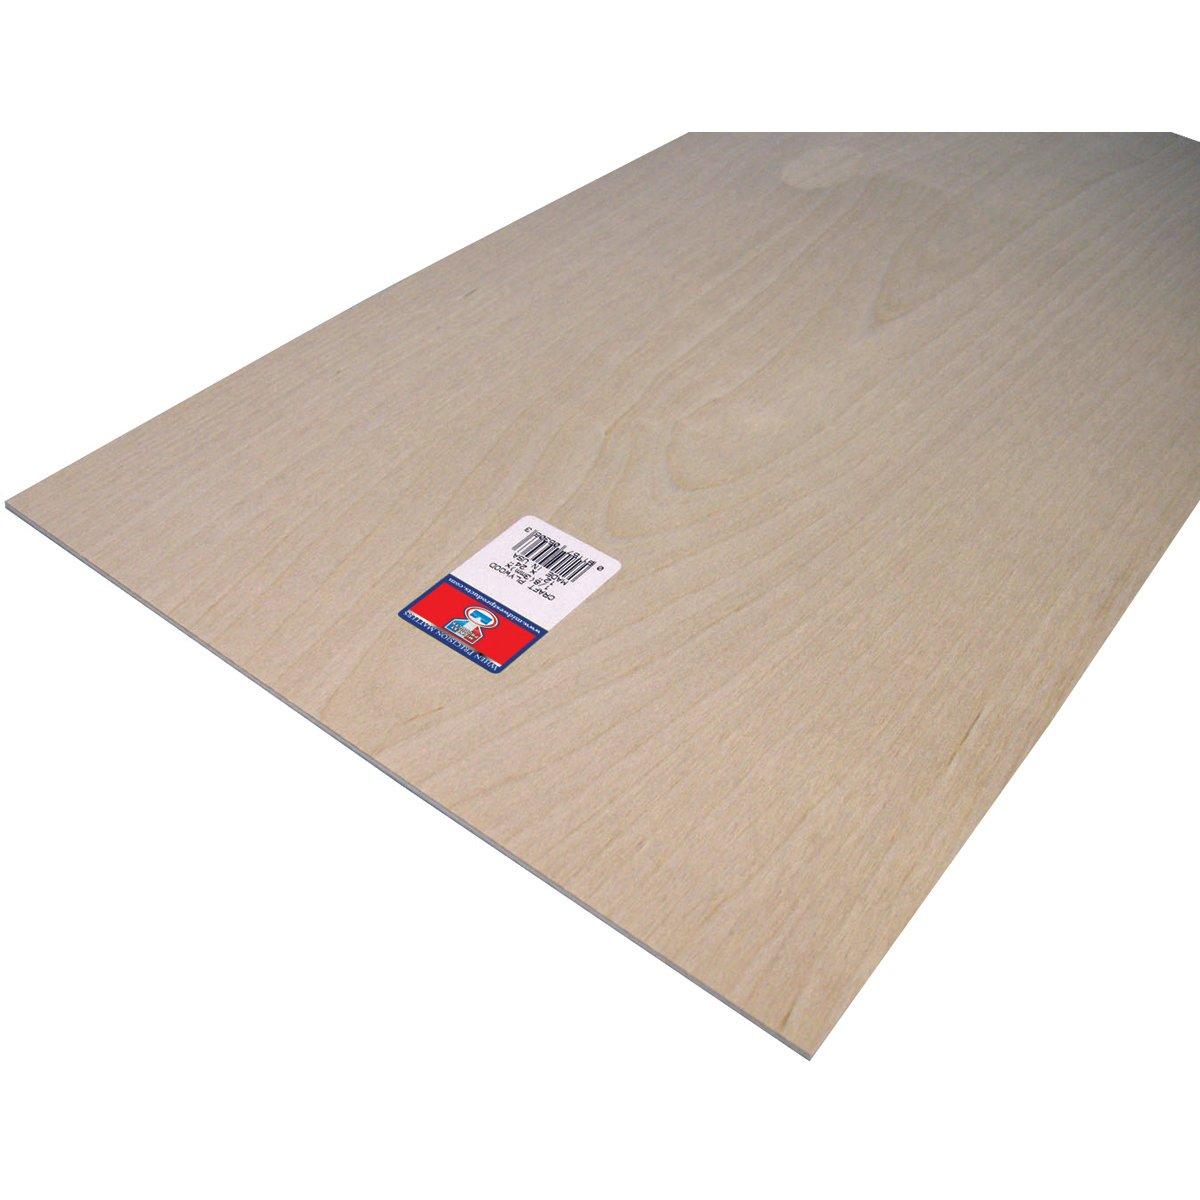 Craft Plywood 1//8 x 12 x 24